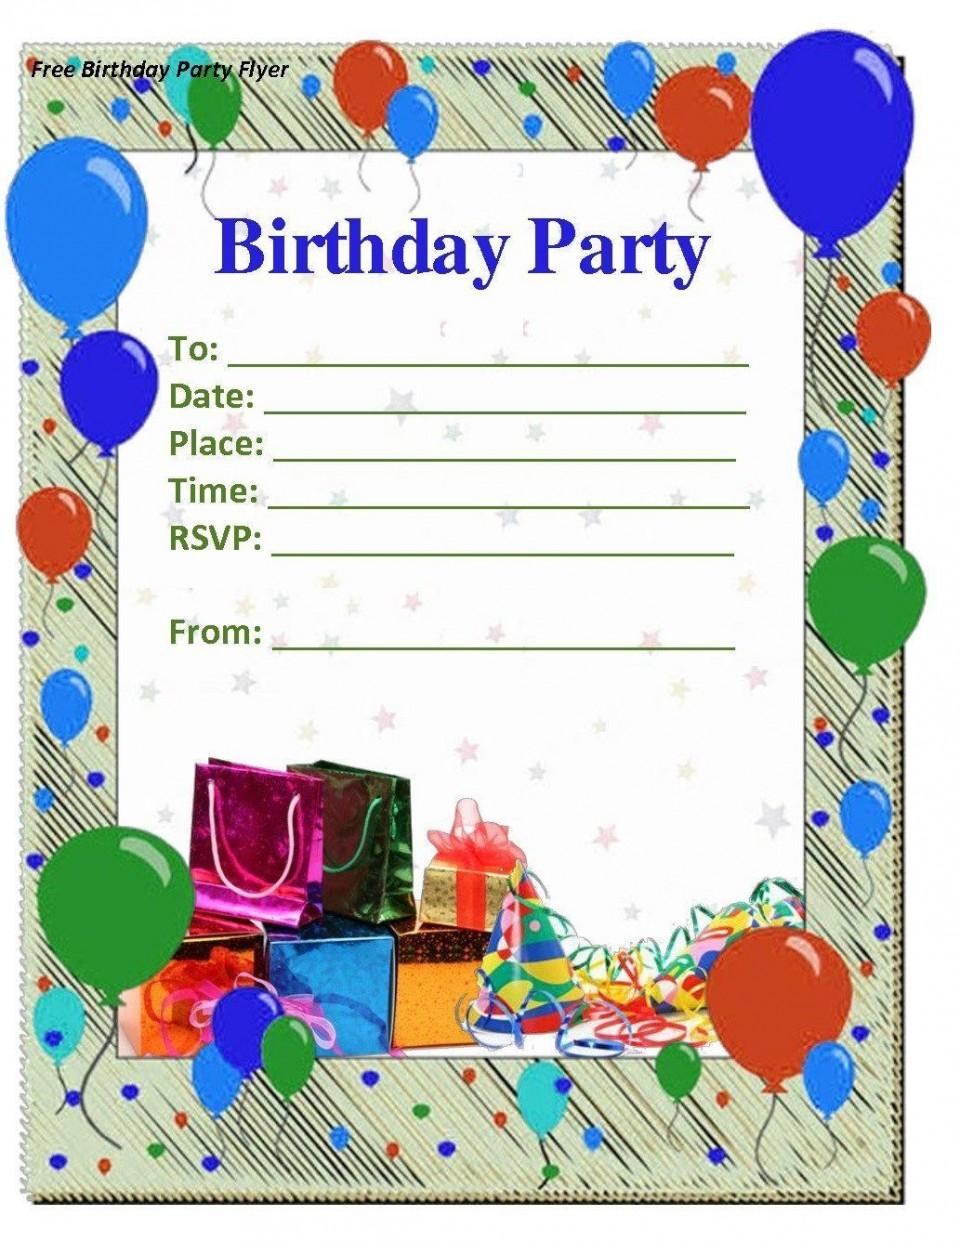 008 Amazing Microsoft Word Birthday Invitation Template Idea  Editable 50th 60th960